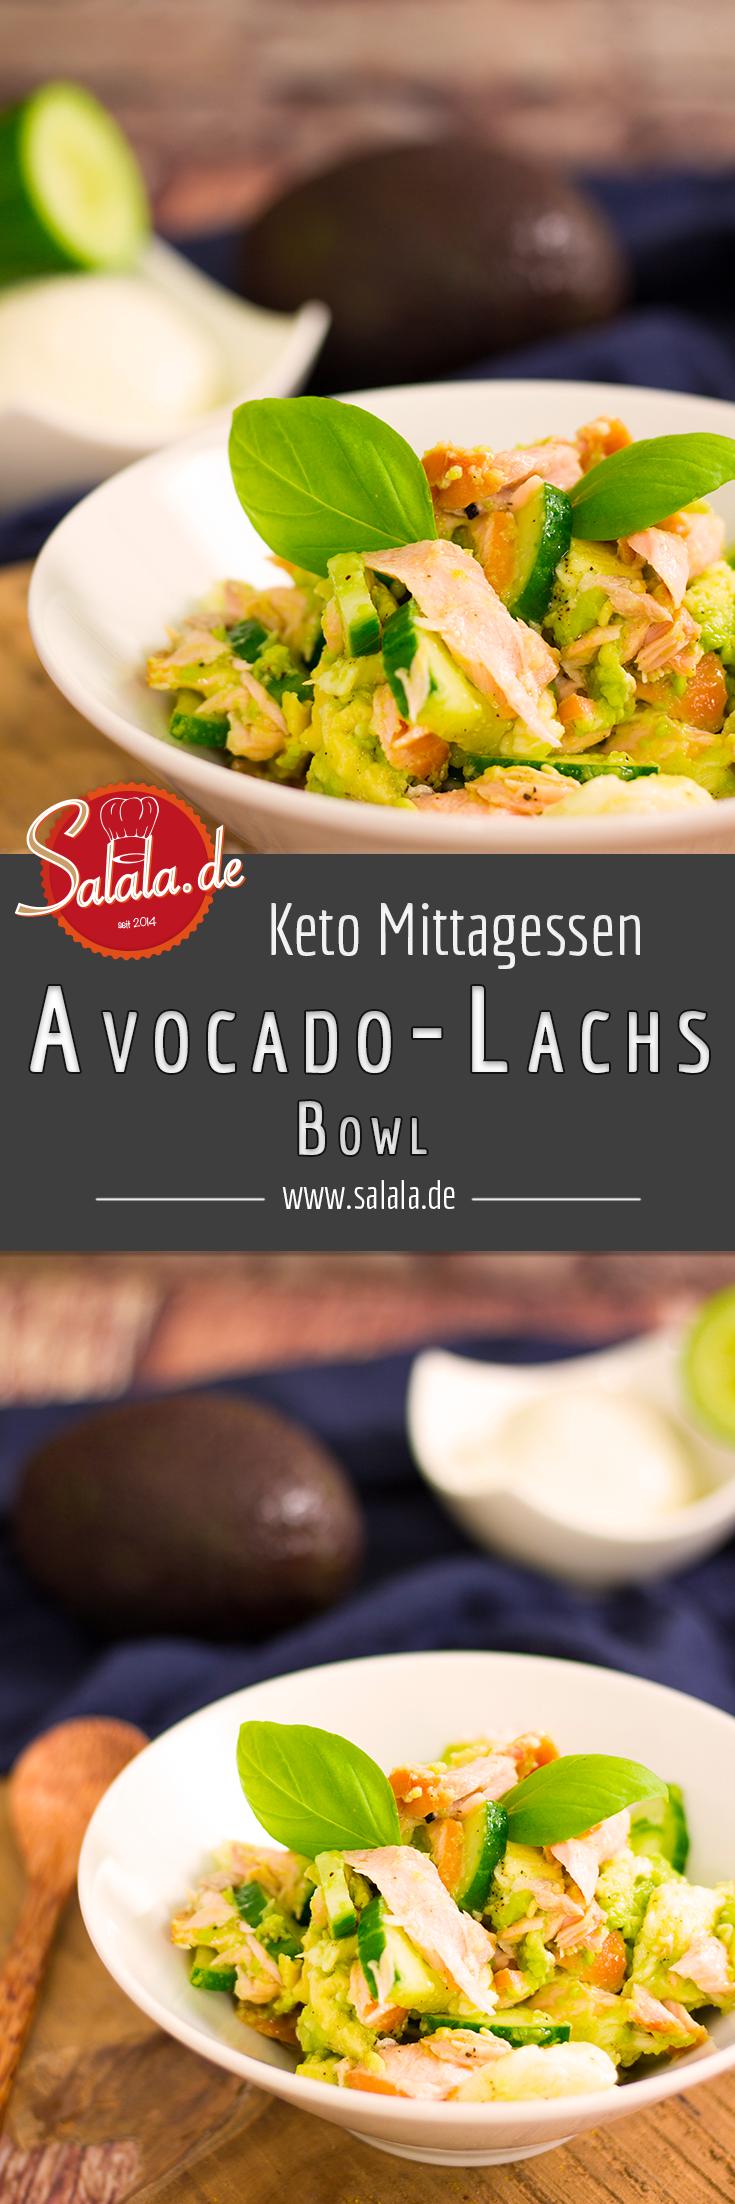 Photo of Avocado-Lachs Bowl – Keto Mittagessen im Büro | salala.de – Low Carb leicht gemacht